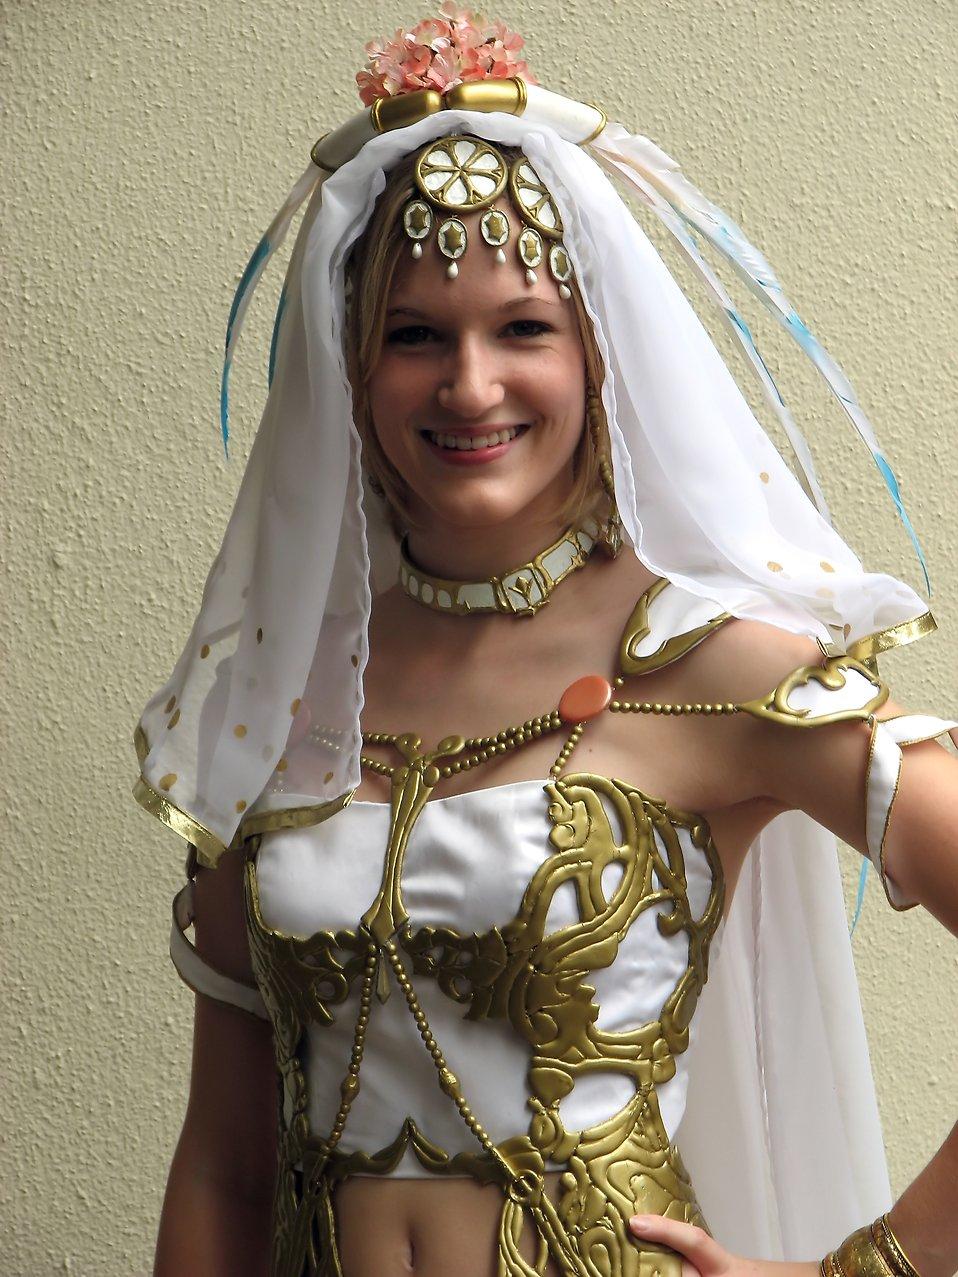 A beautiful girl in a costume at Dragoncon 2009 in Atlanta, Georgia : Free Stock Photo